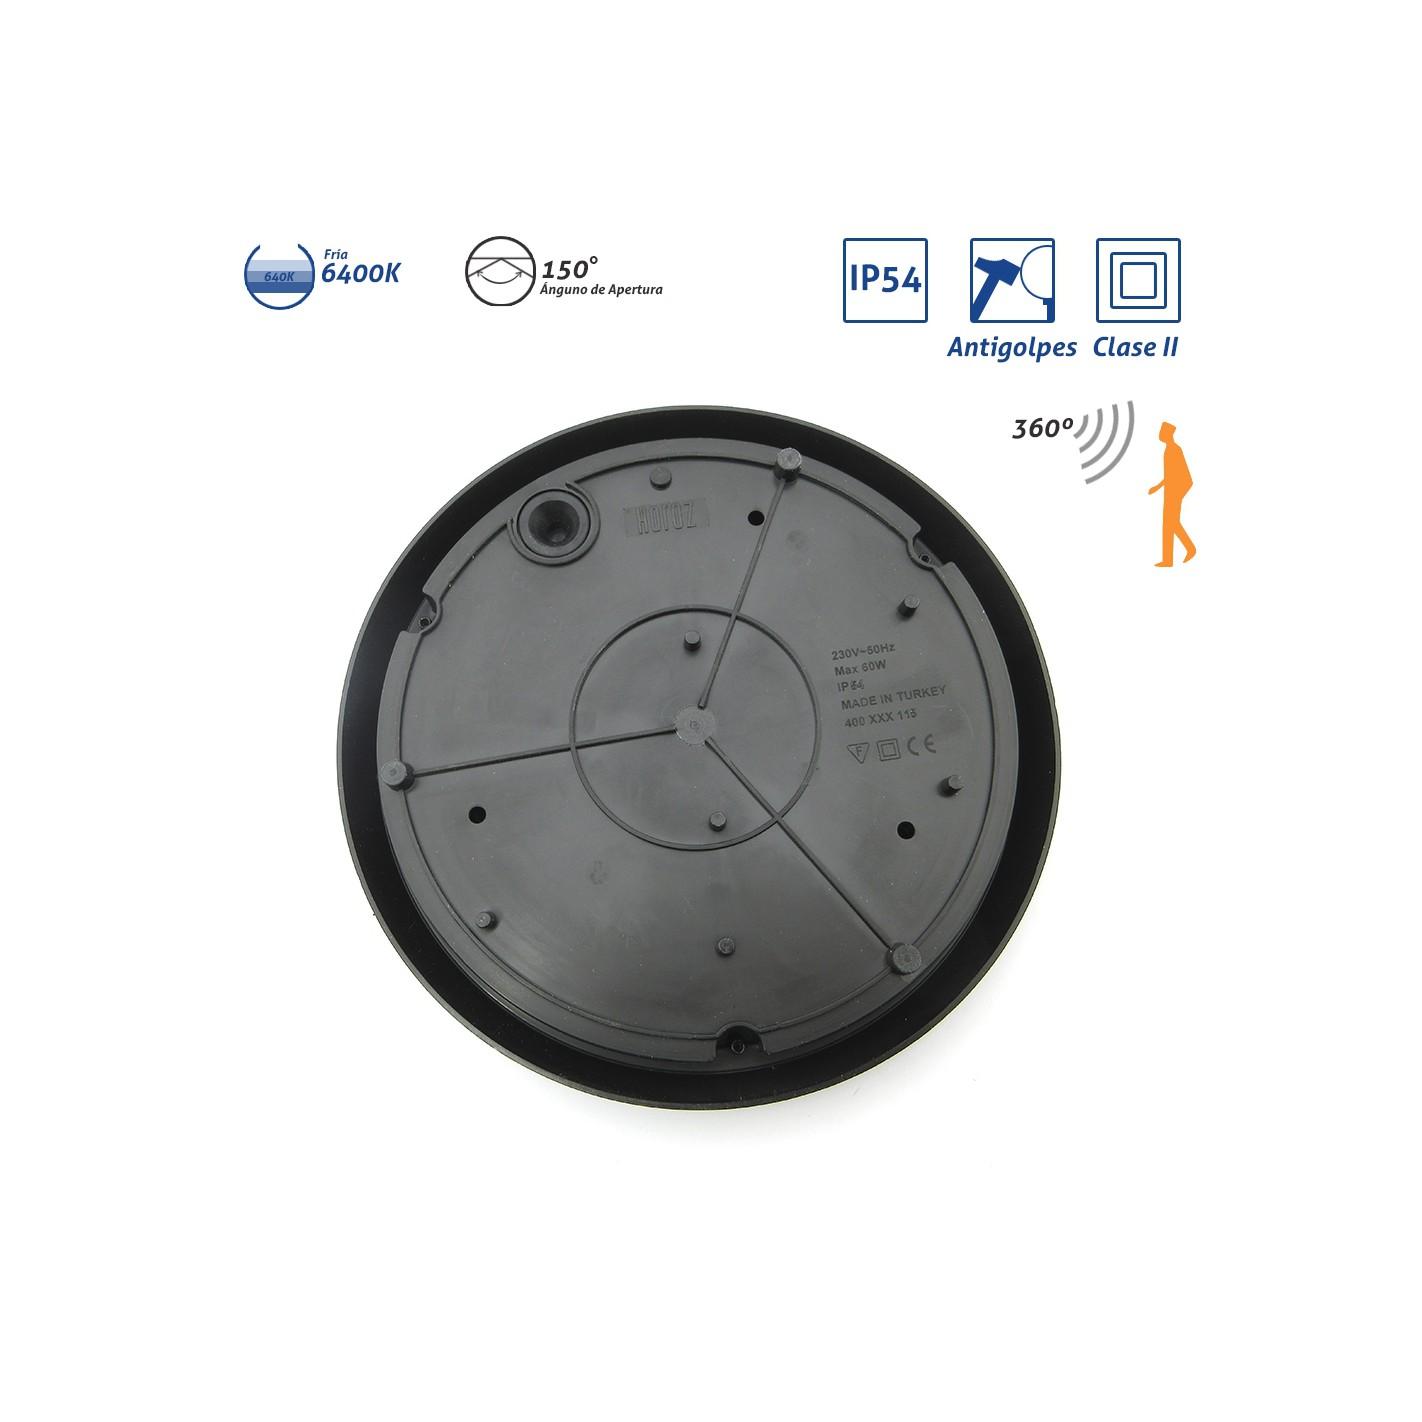 Plaf n exterior ip54 clase ii antivand lico negro led for Plafon pared led con sensor pir